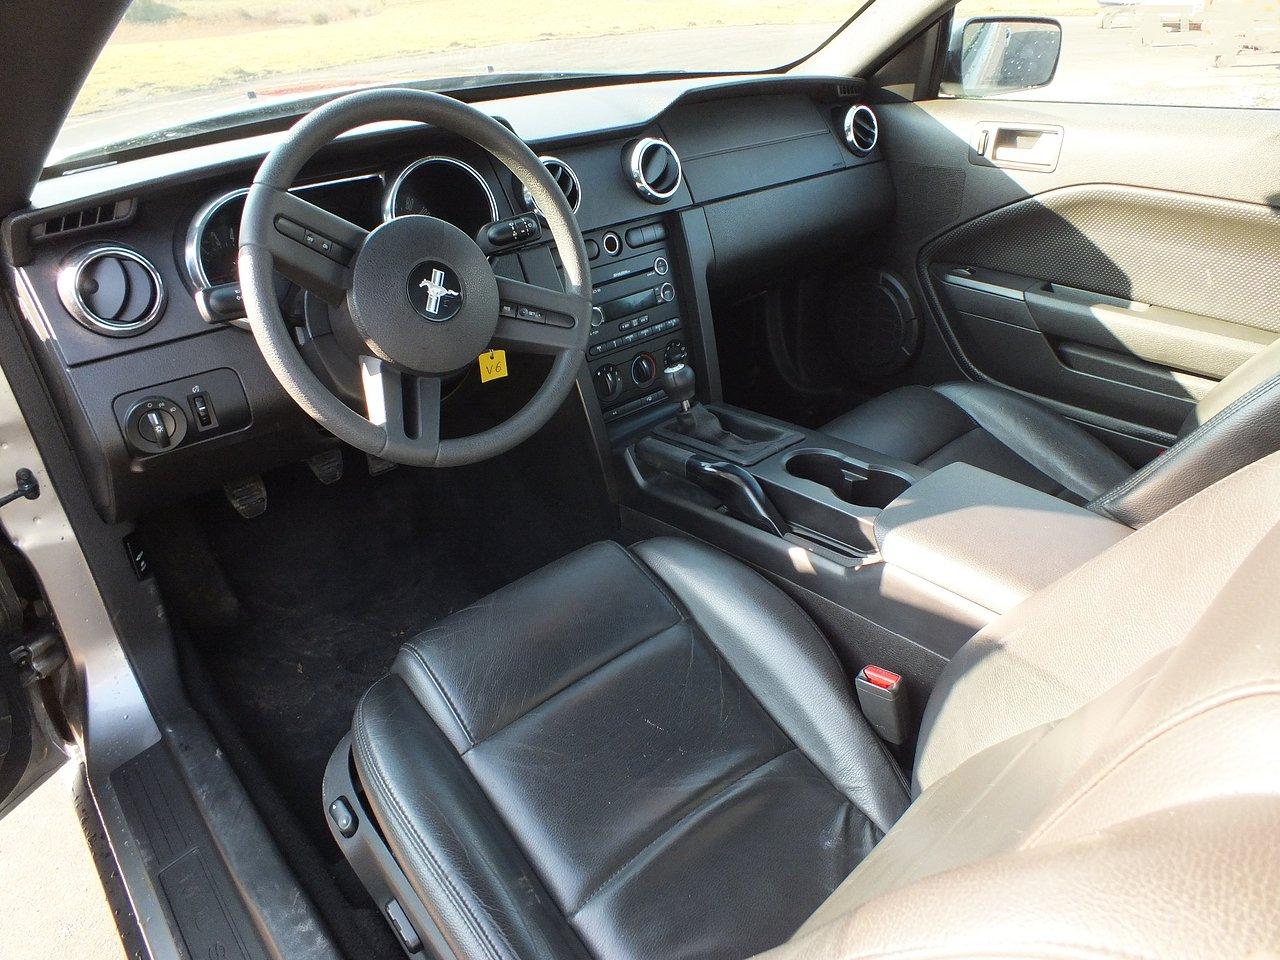 Mustang+Interieur